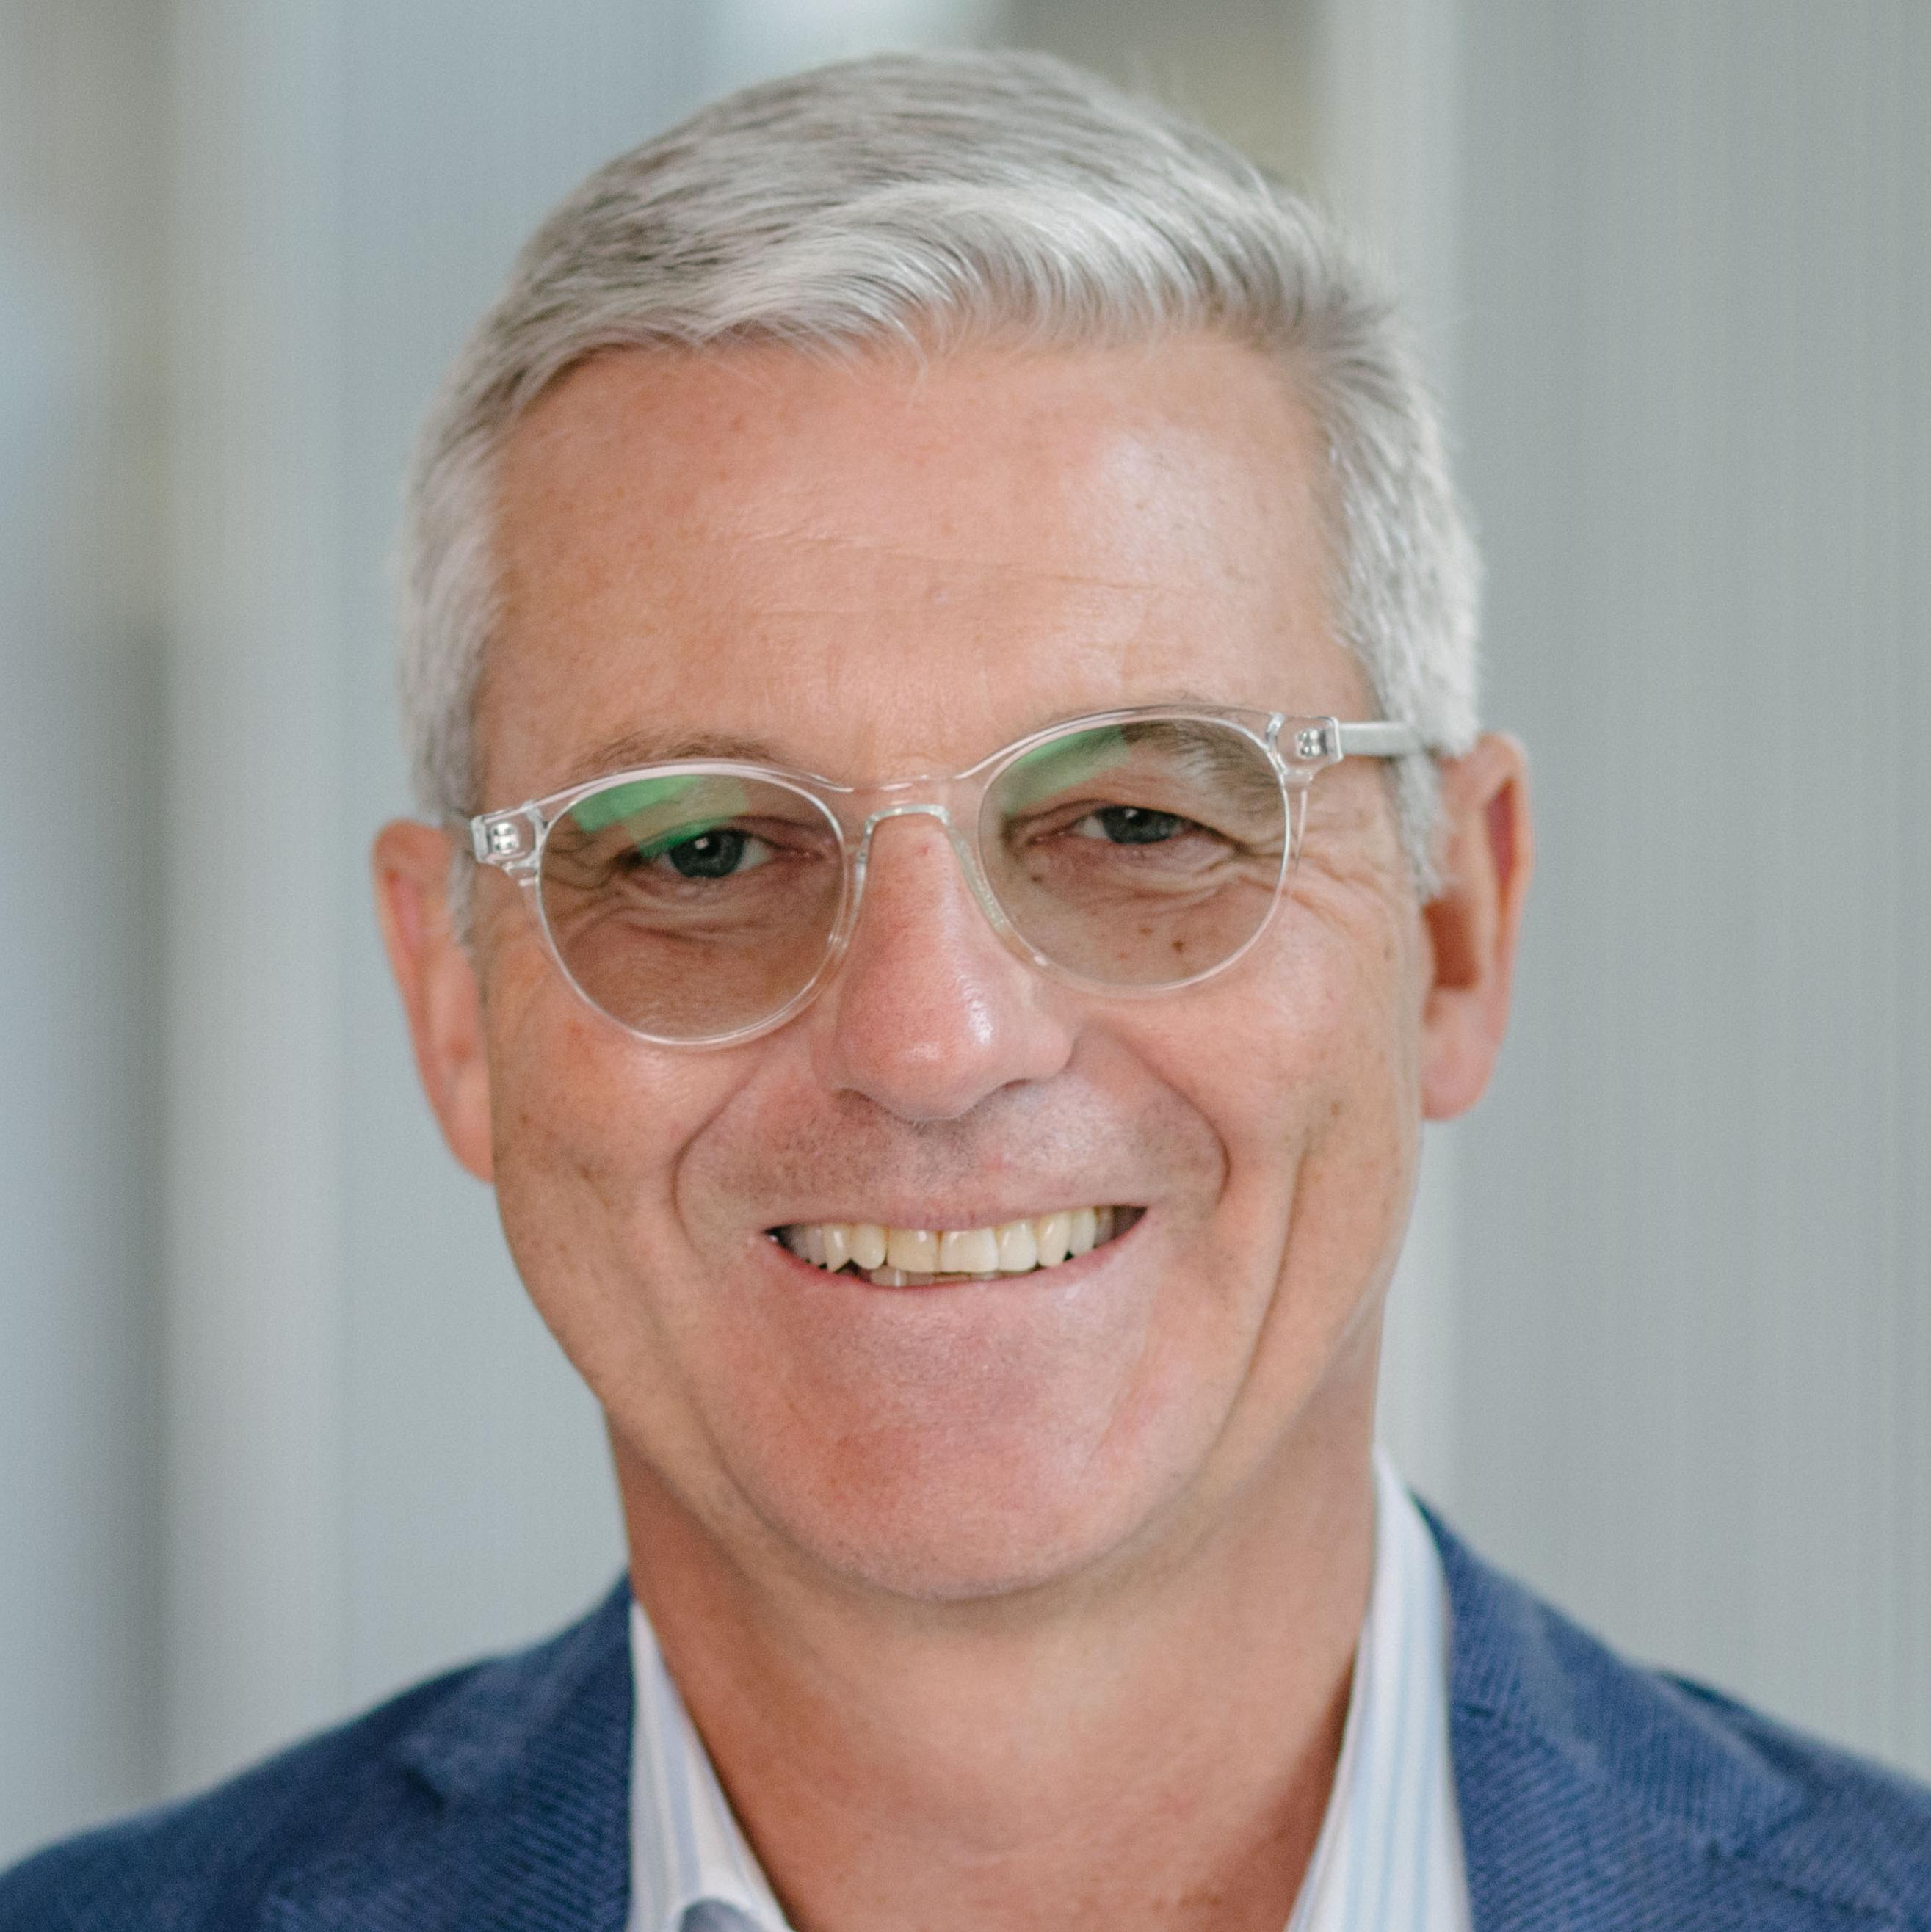 Markus Aicher